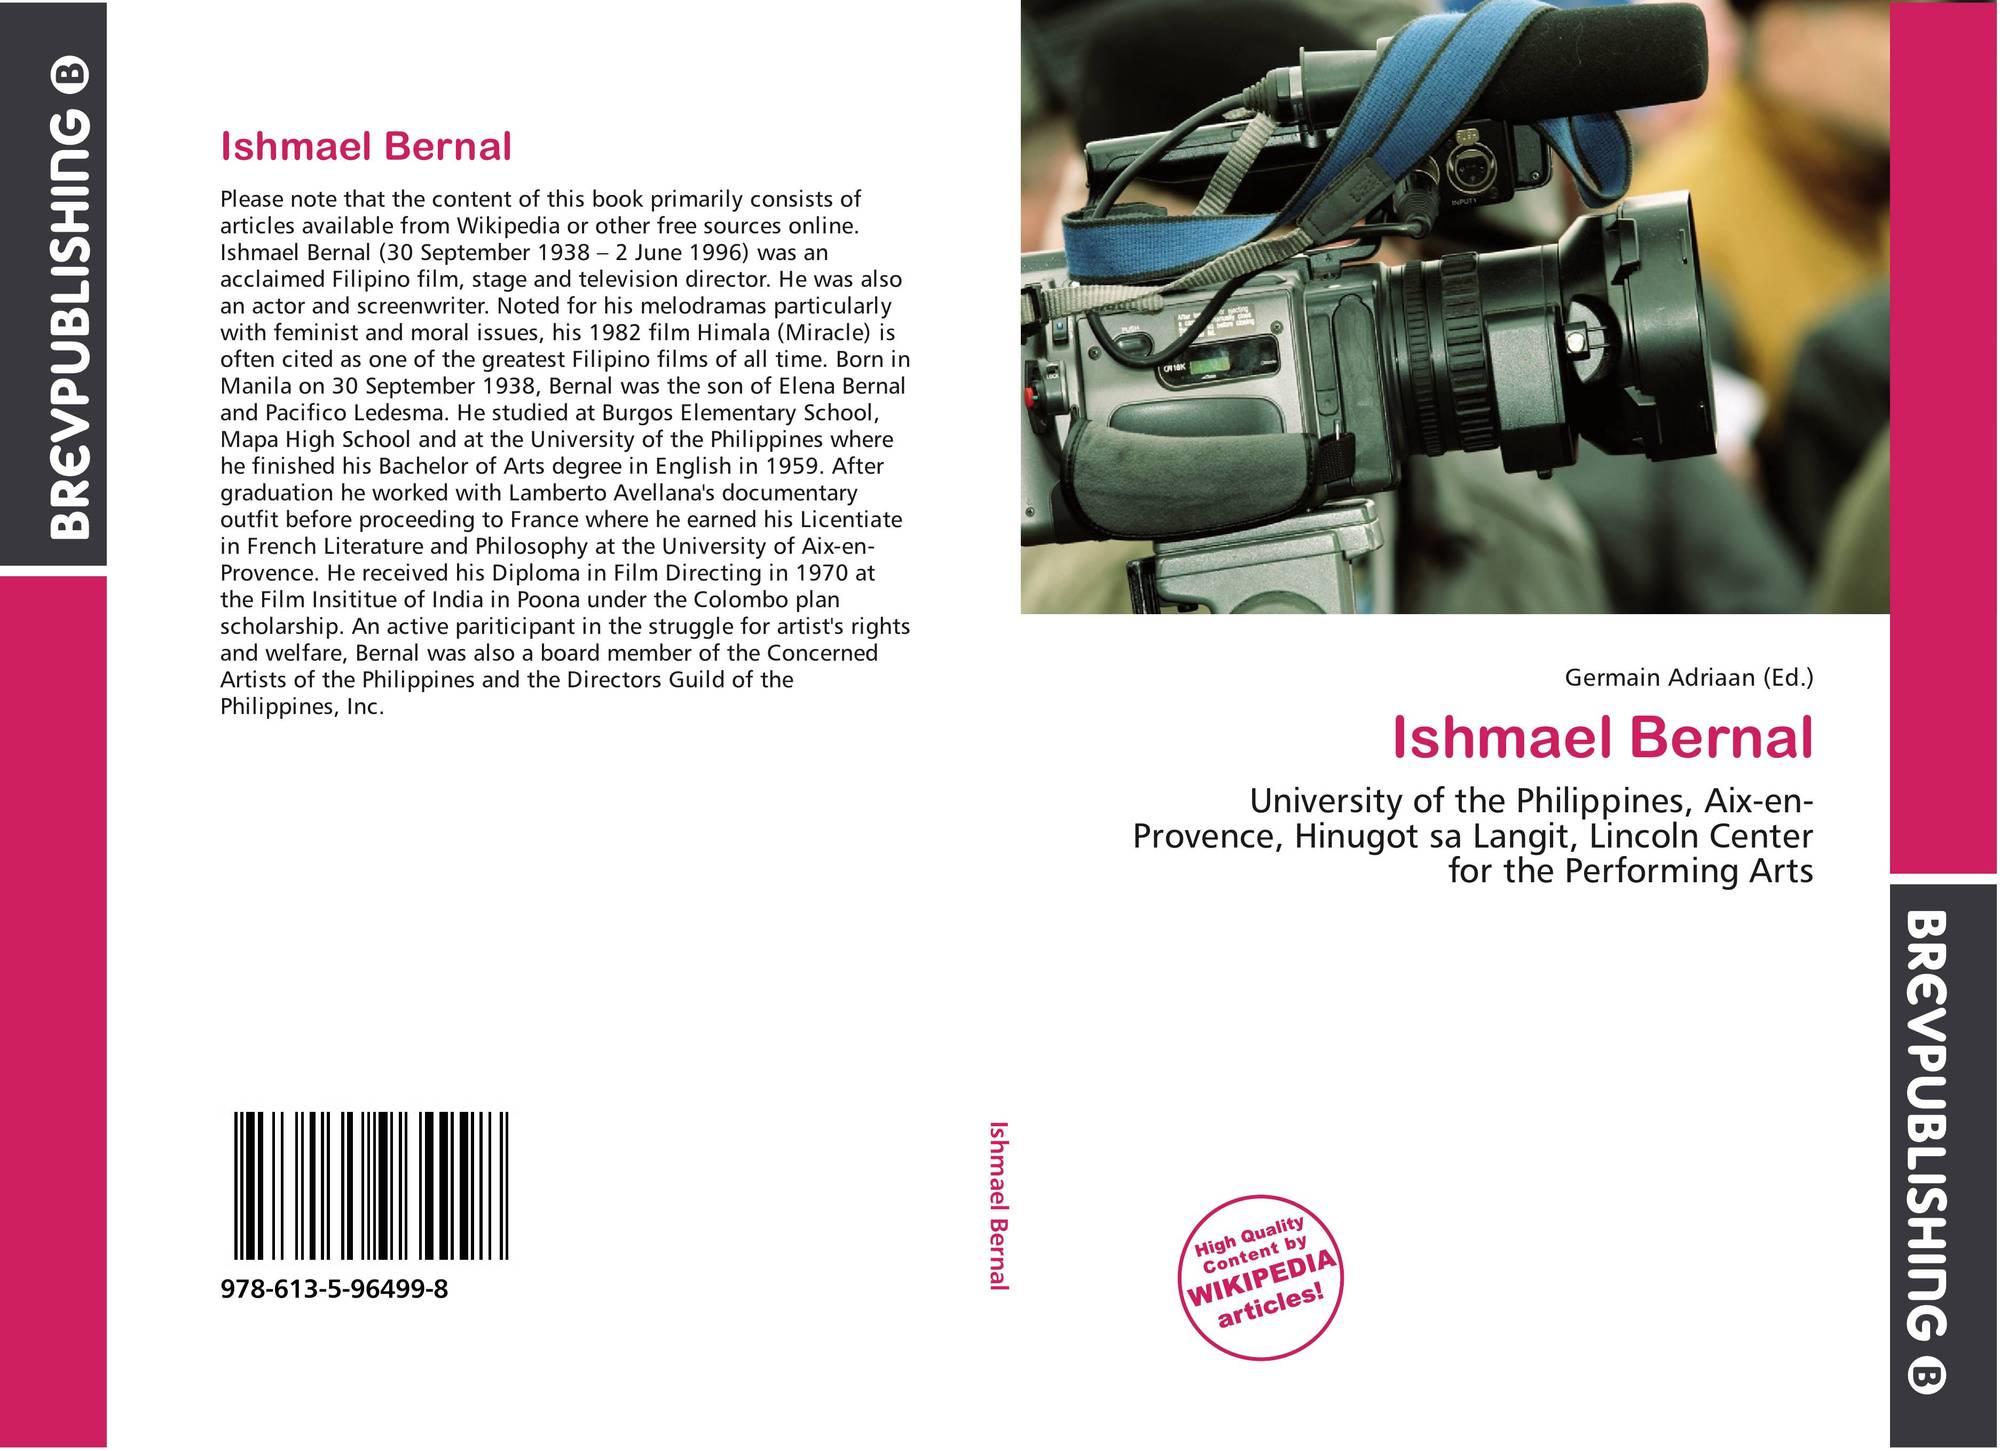 ishmael bernal and religious interpretations